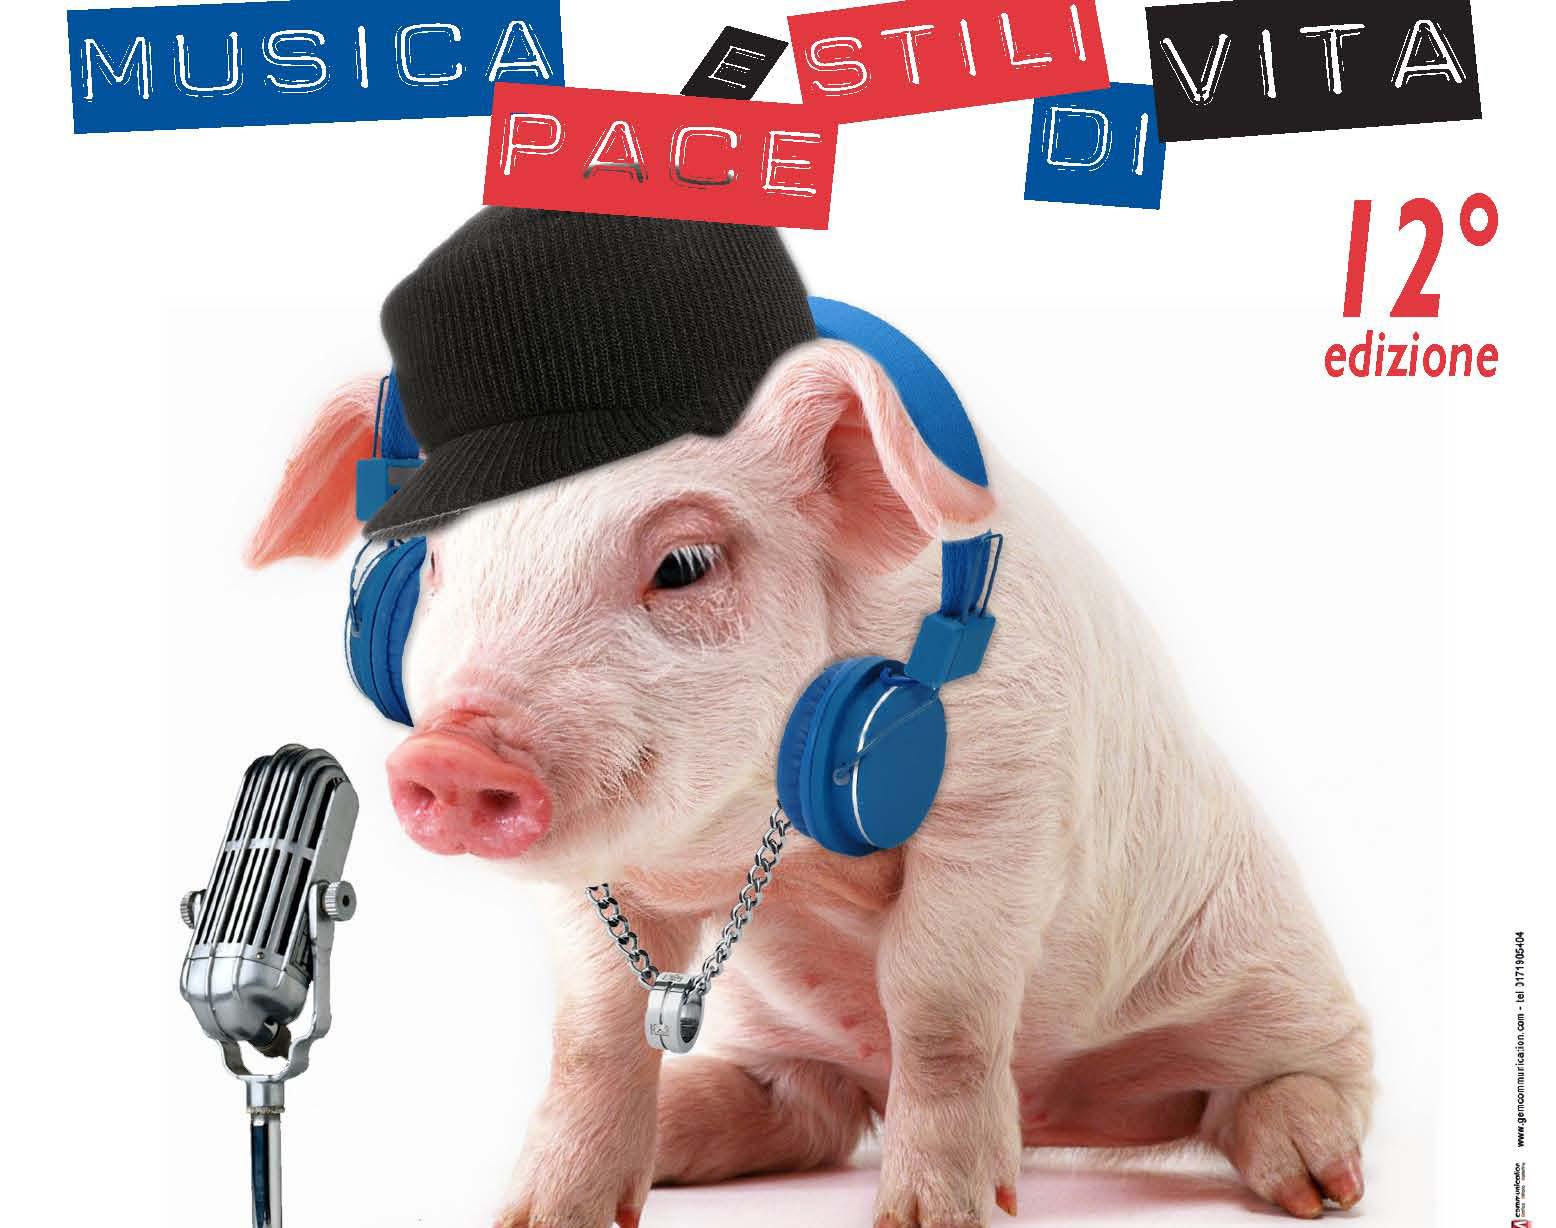 Aclinfestivalrock: musica e solidarietà